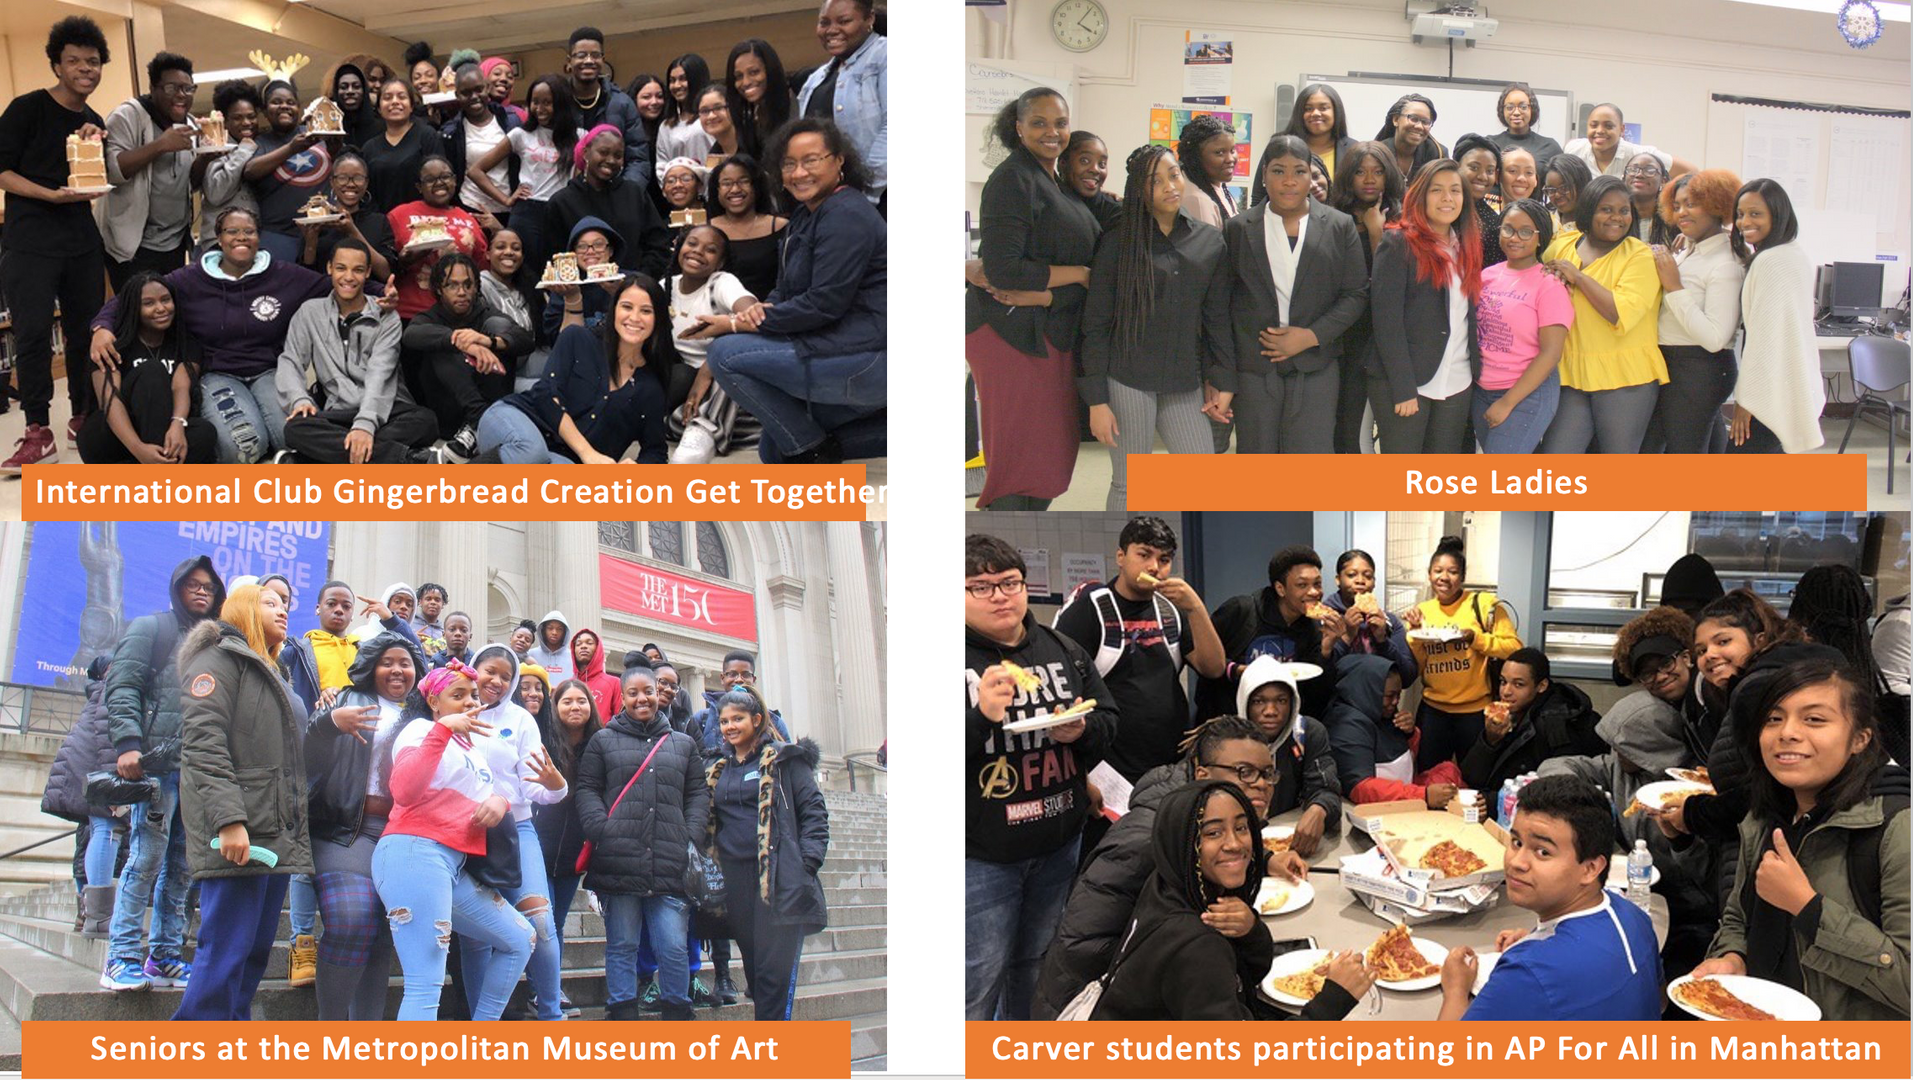 Group photos of GWCHSS Clubs (International Club, Rose Ladies)